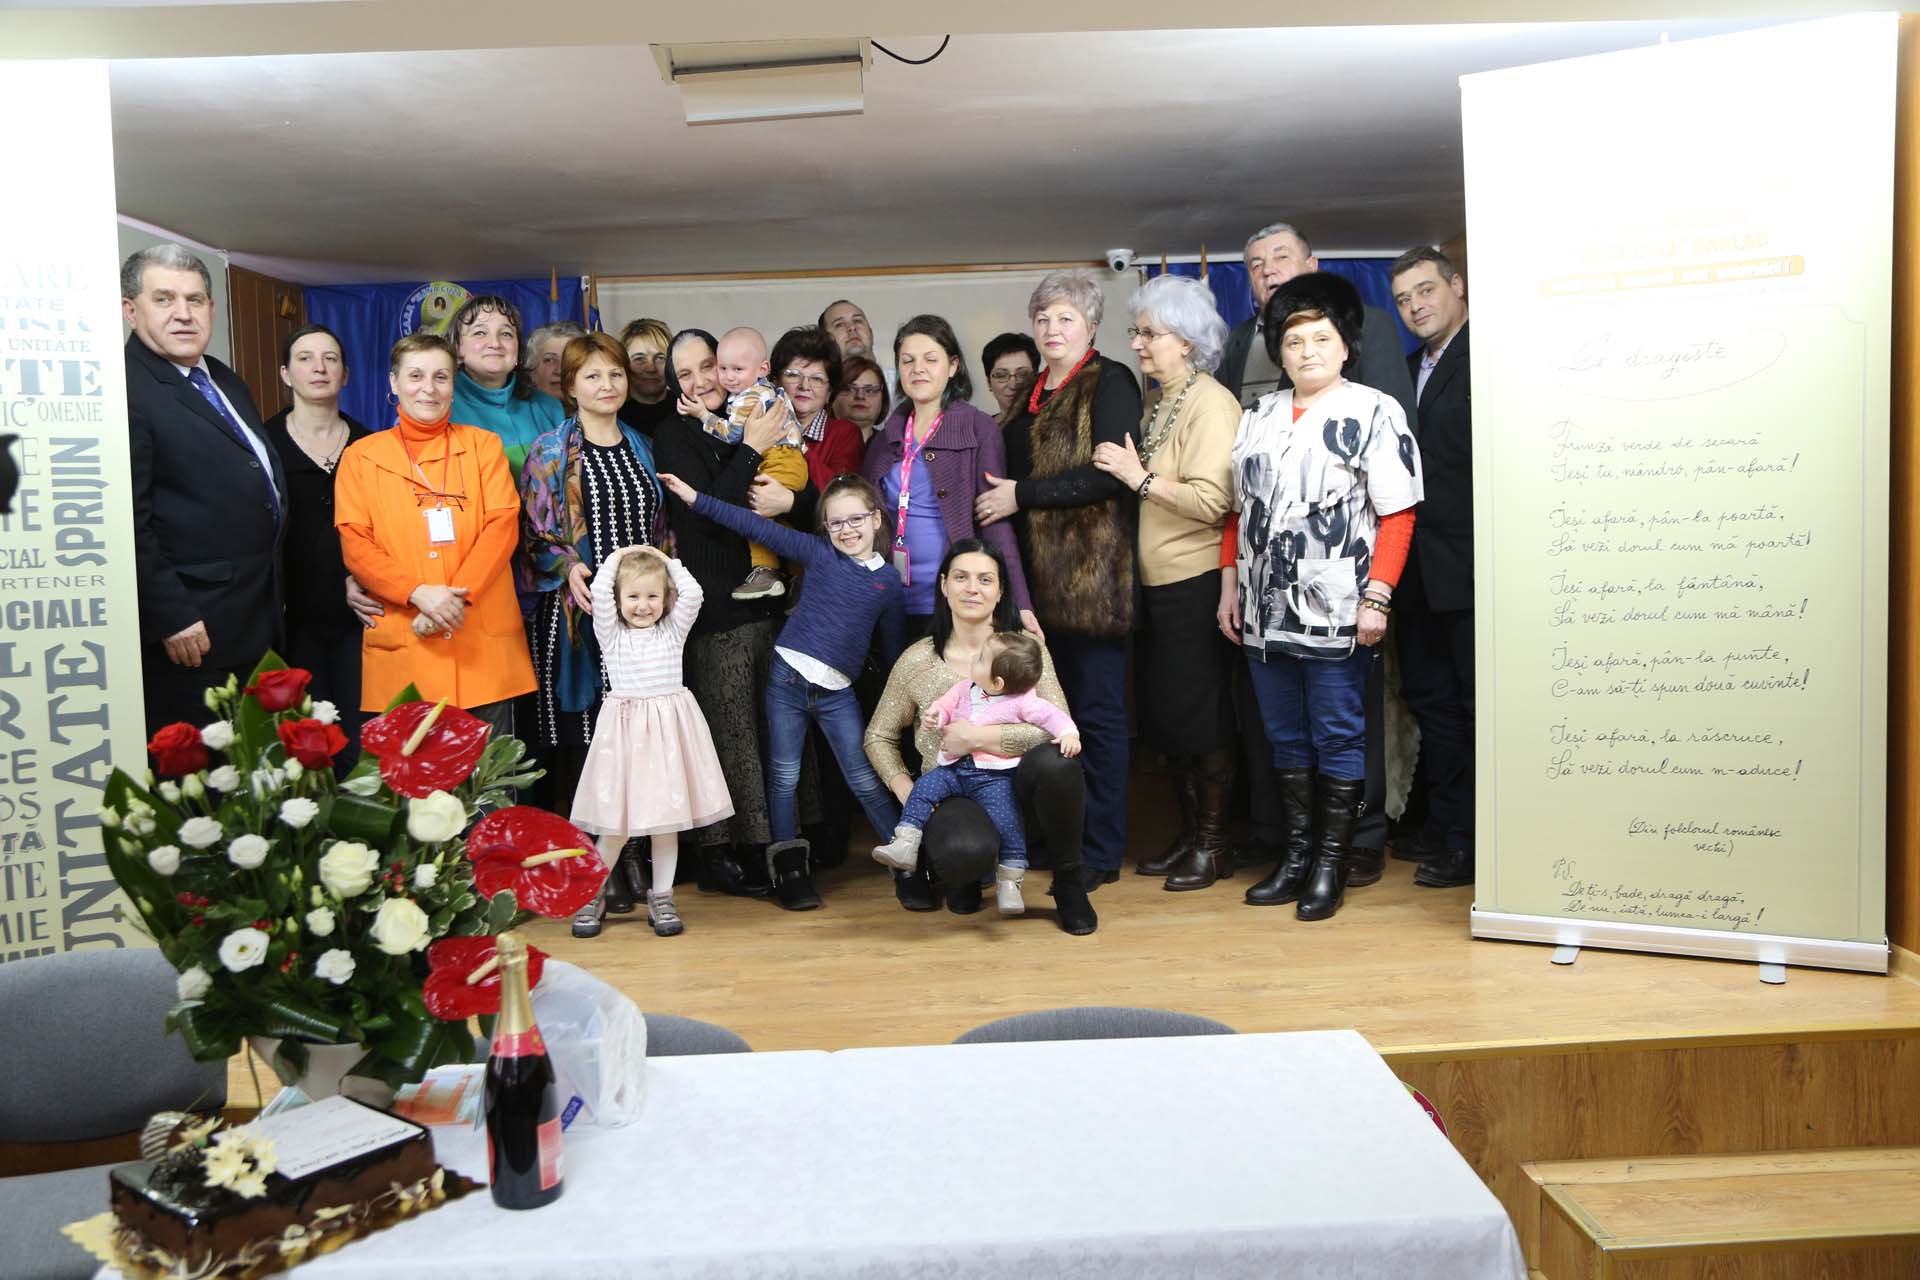 Festivitate de pensionare - Livia Pavel